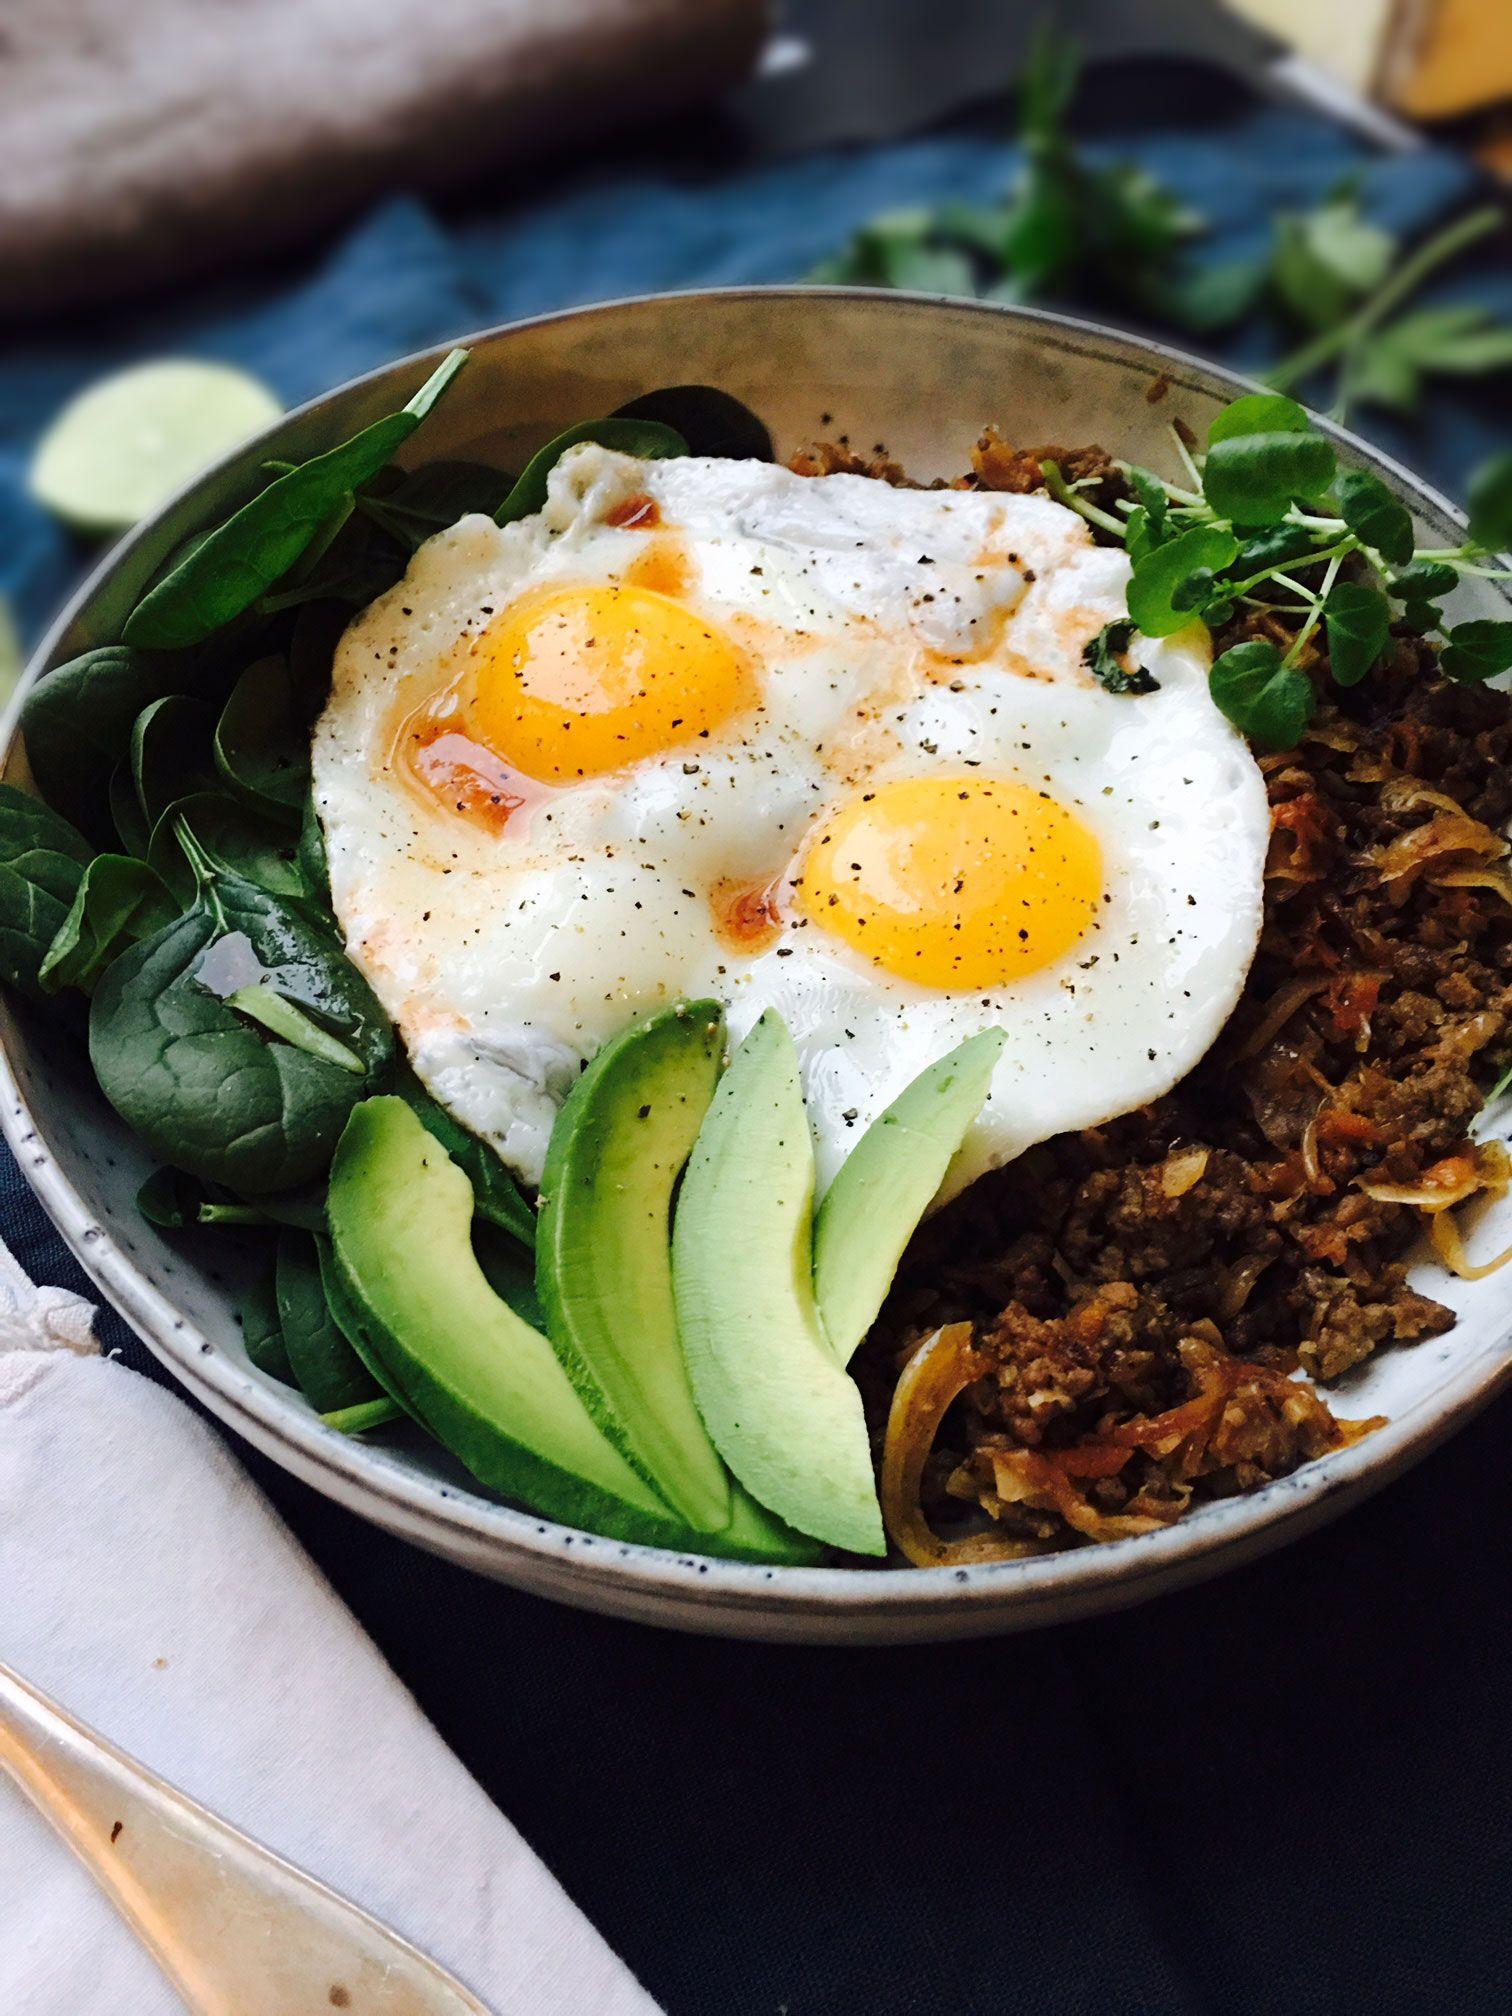 Healthy Breakfast That Keeps You Full  Healthy breakfast bowl that will keep you full until lunch